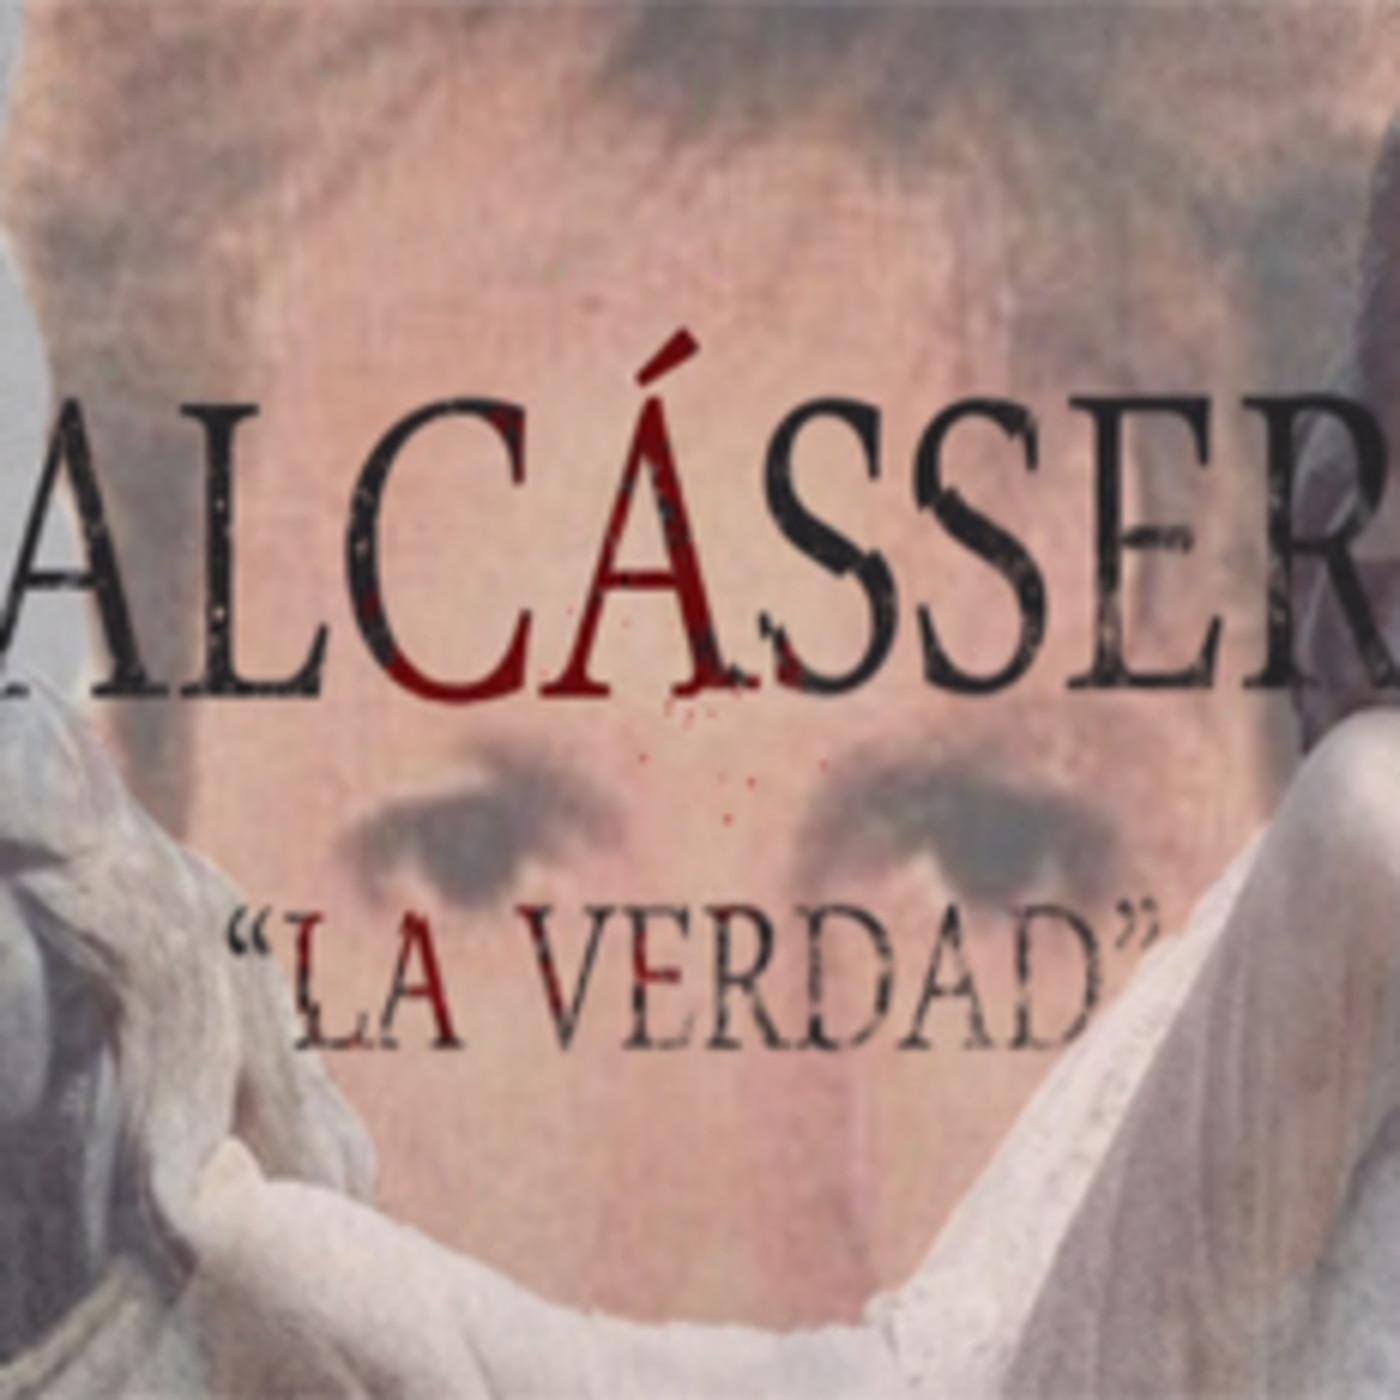 Alcásser: La verdad - Con Pedro Avilés